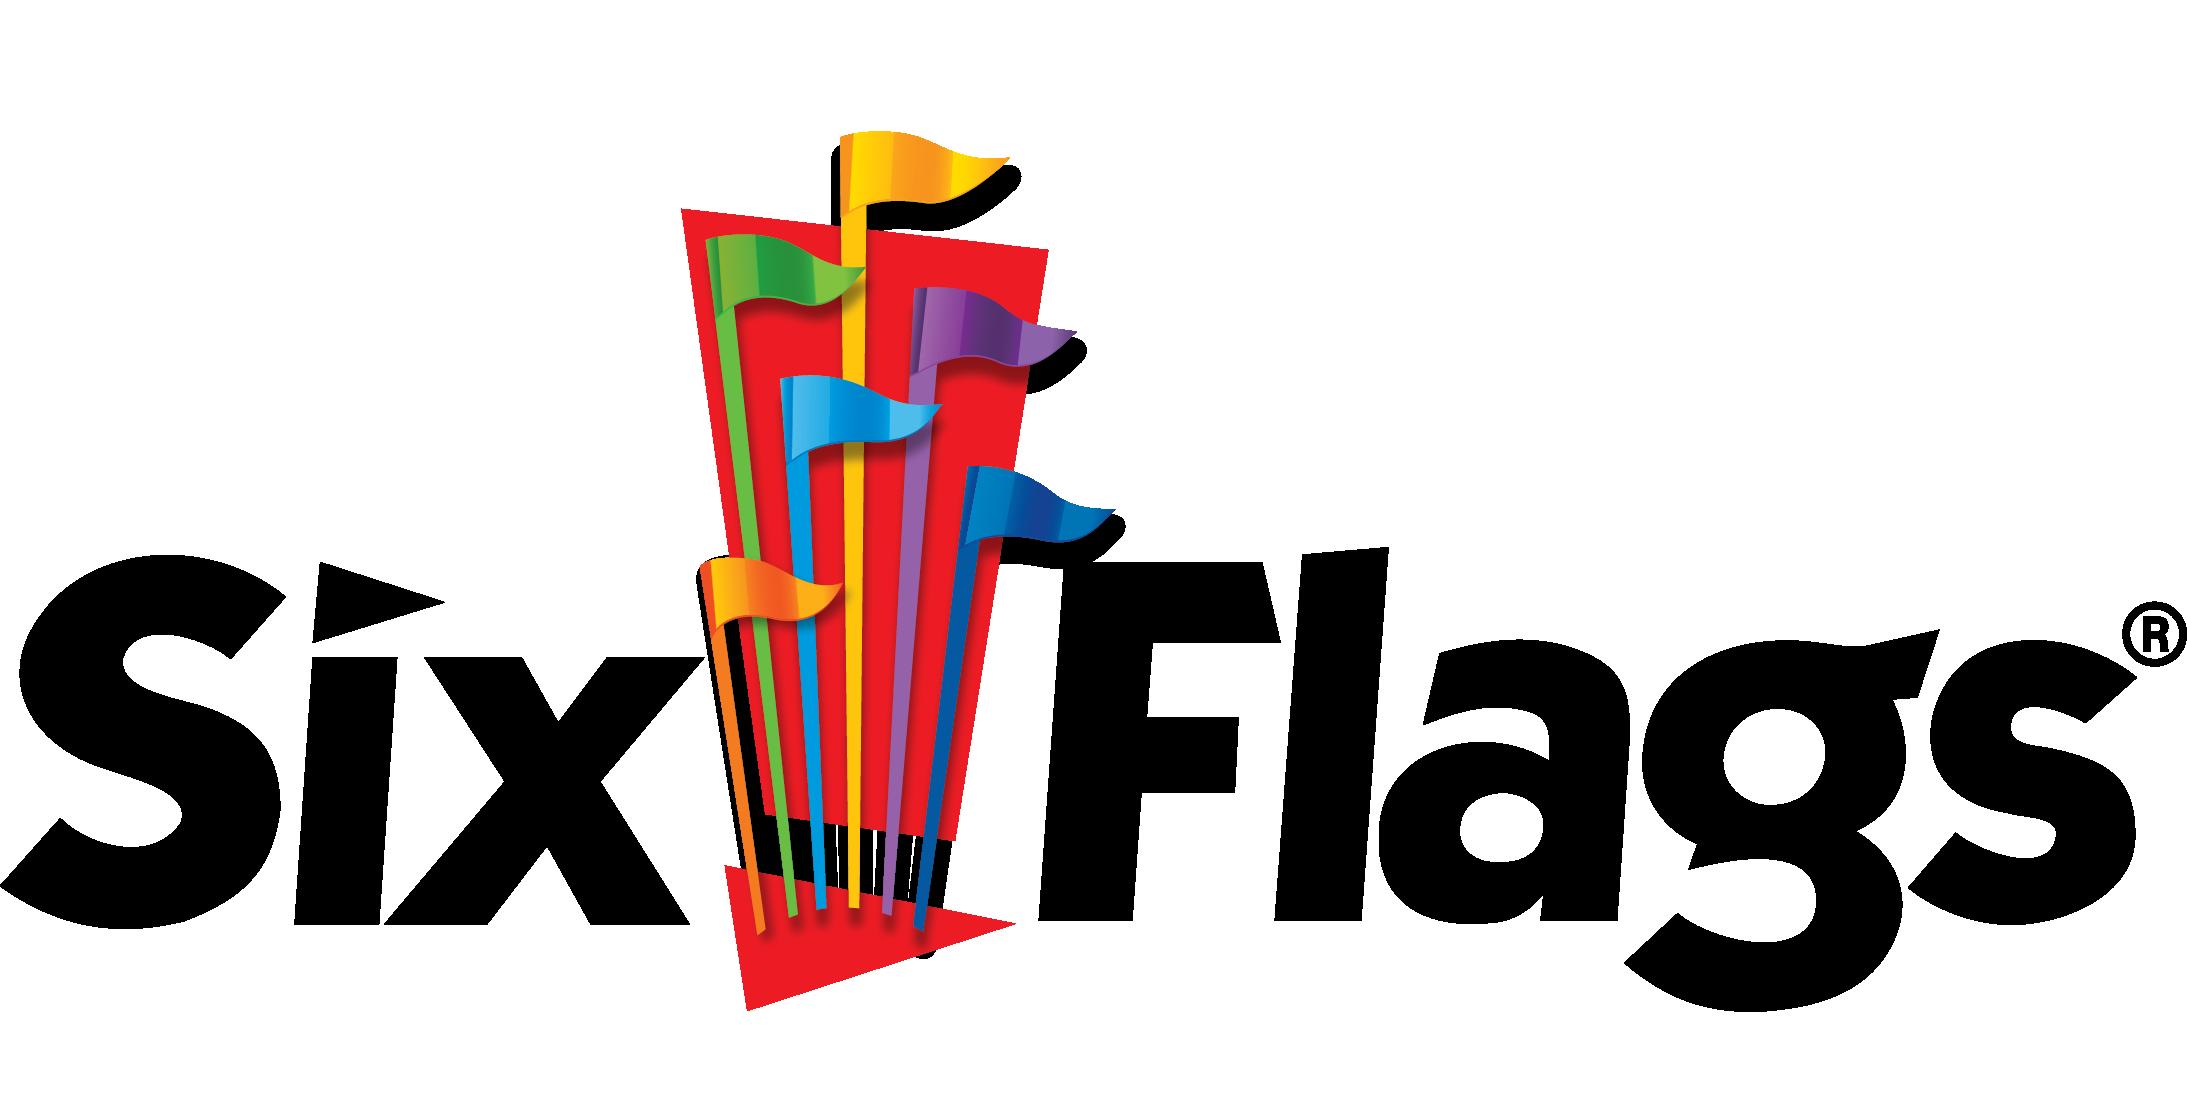 Six_Flags_logo.png